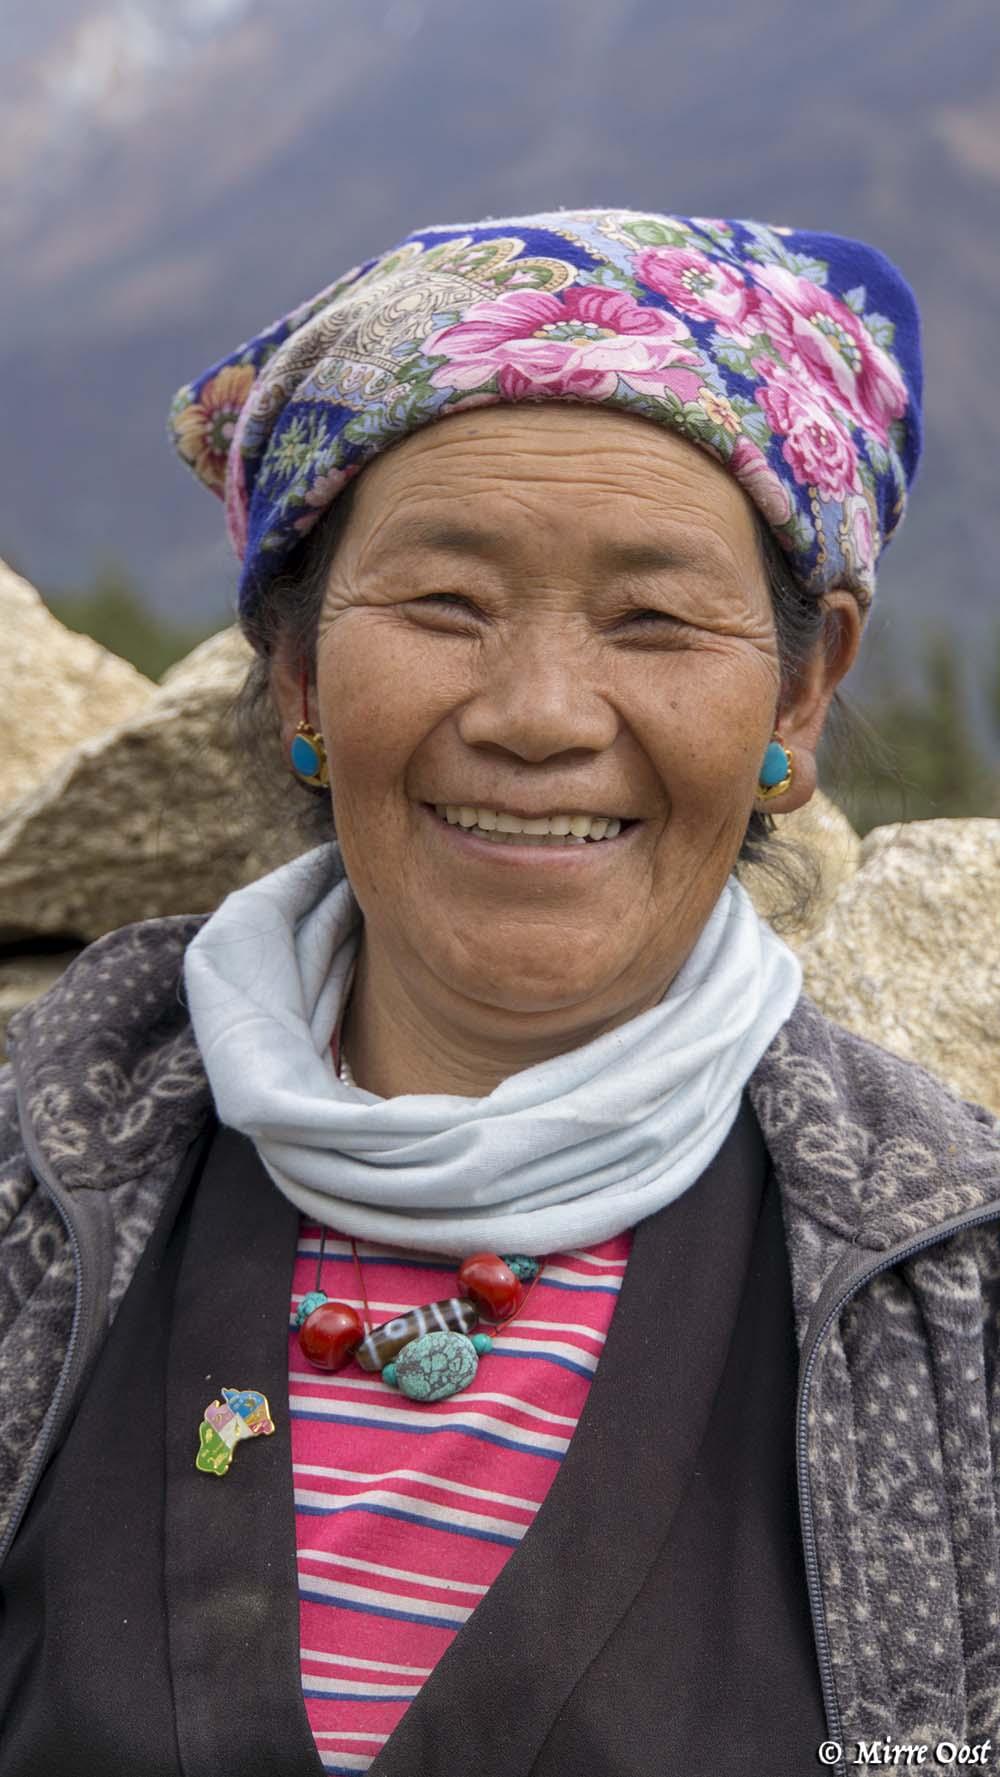 Nepalese mevrouw in traditionele kledij.